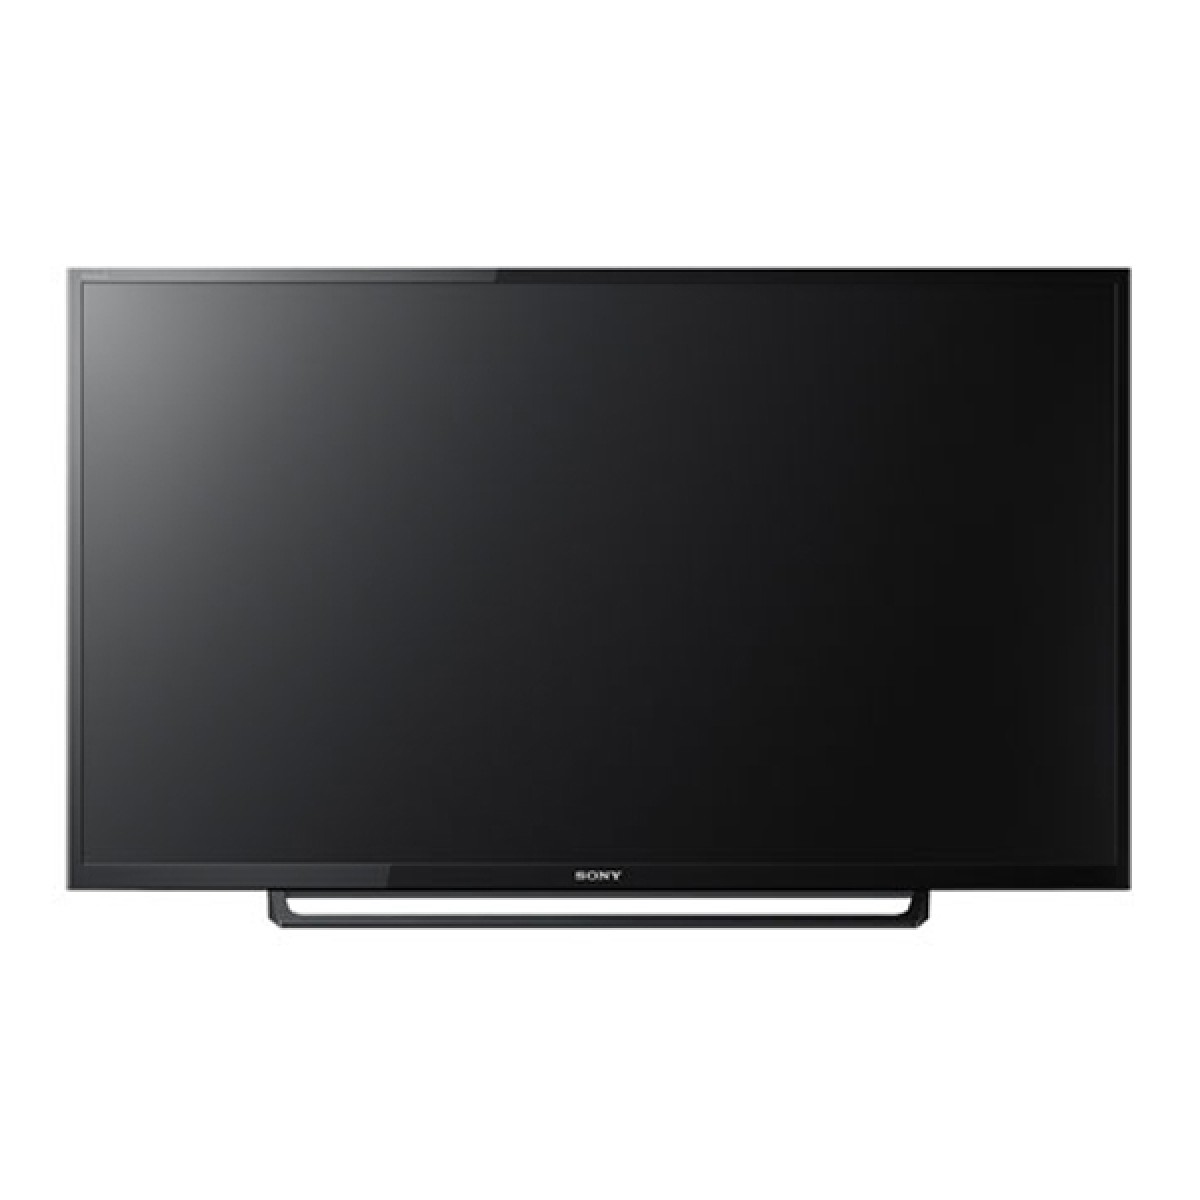 "Sony 40"" FHD LED TV (KLV-40R352E)"